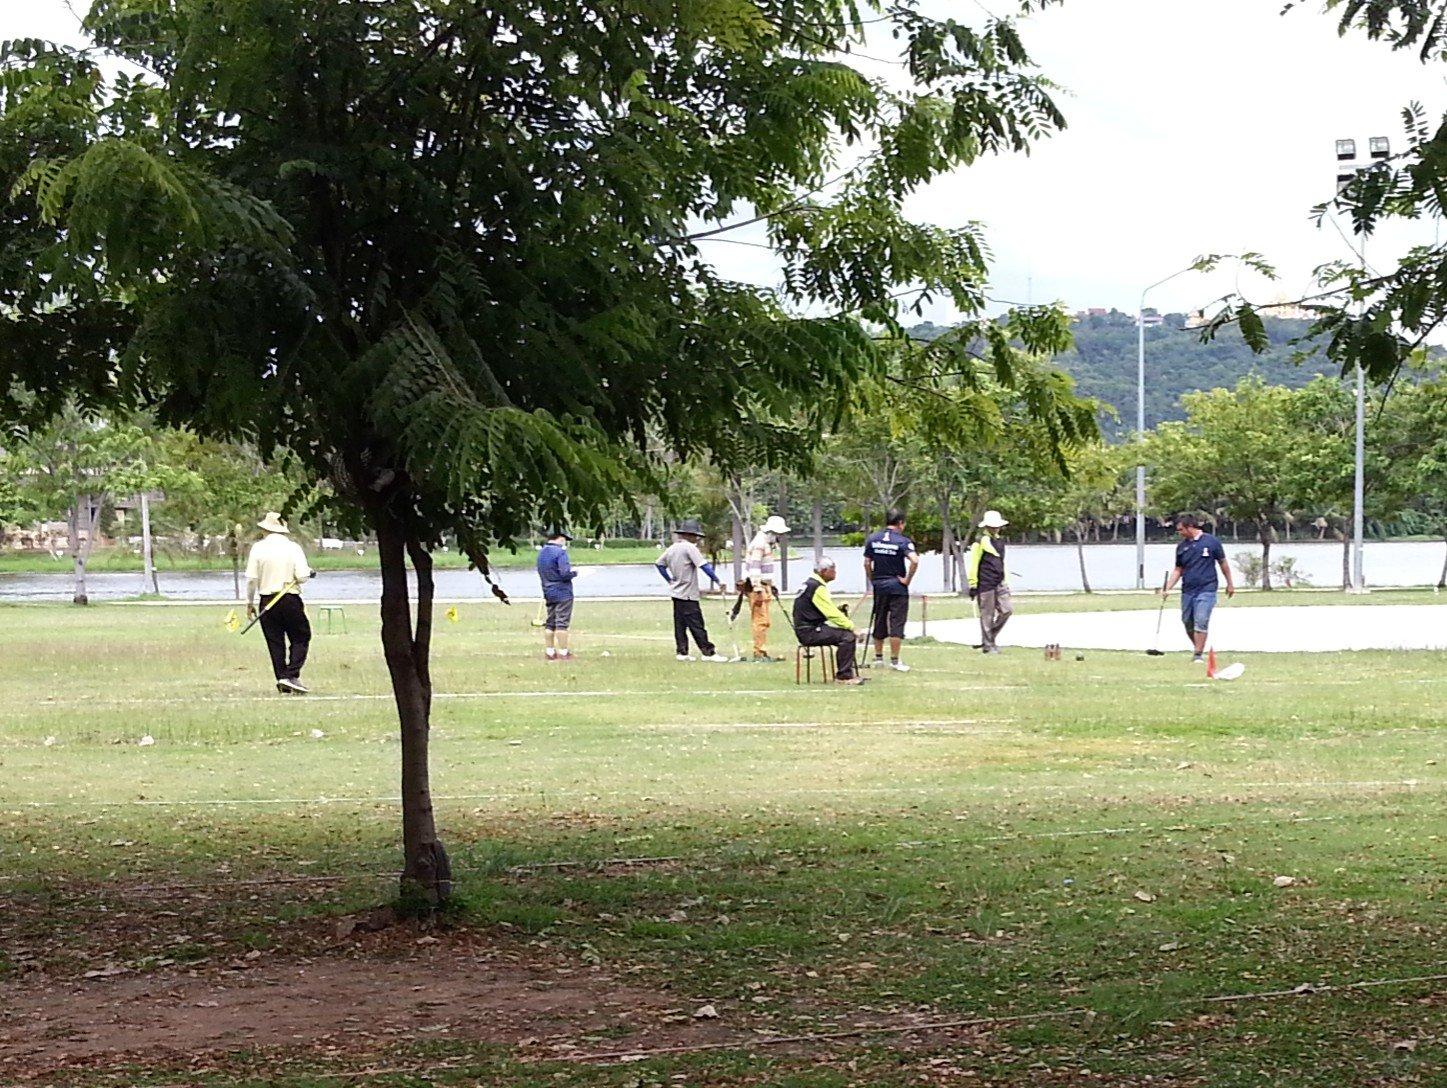 Woodball club in Paradise Park